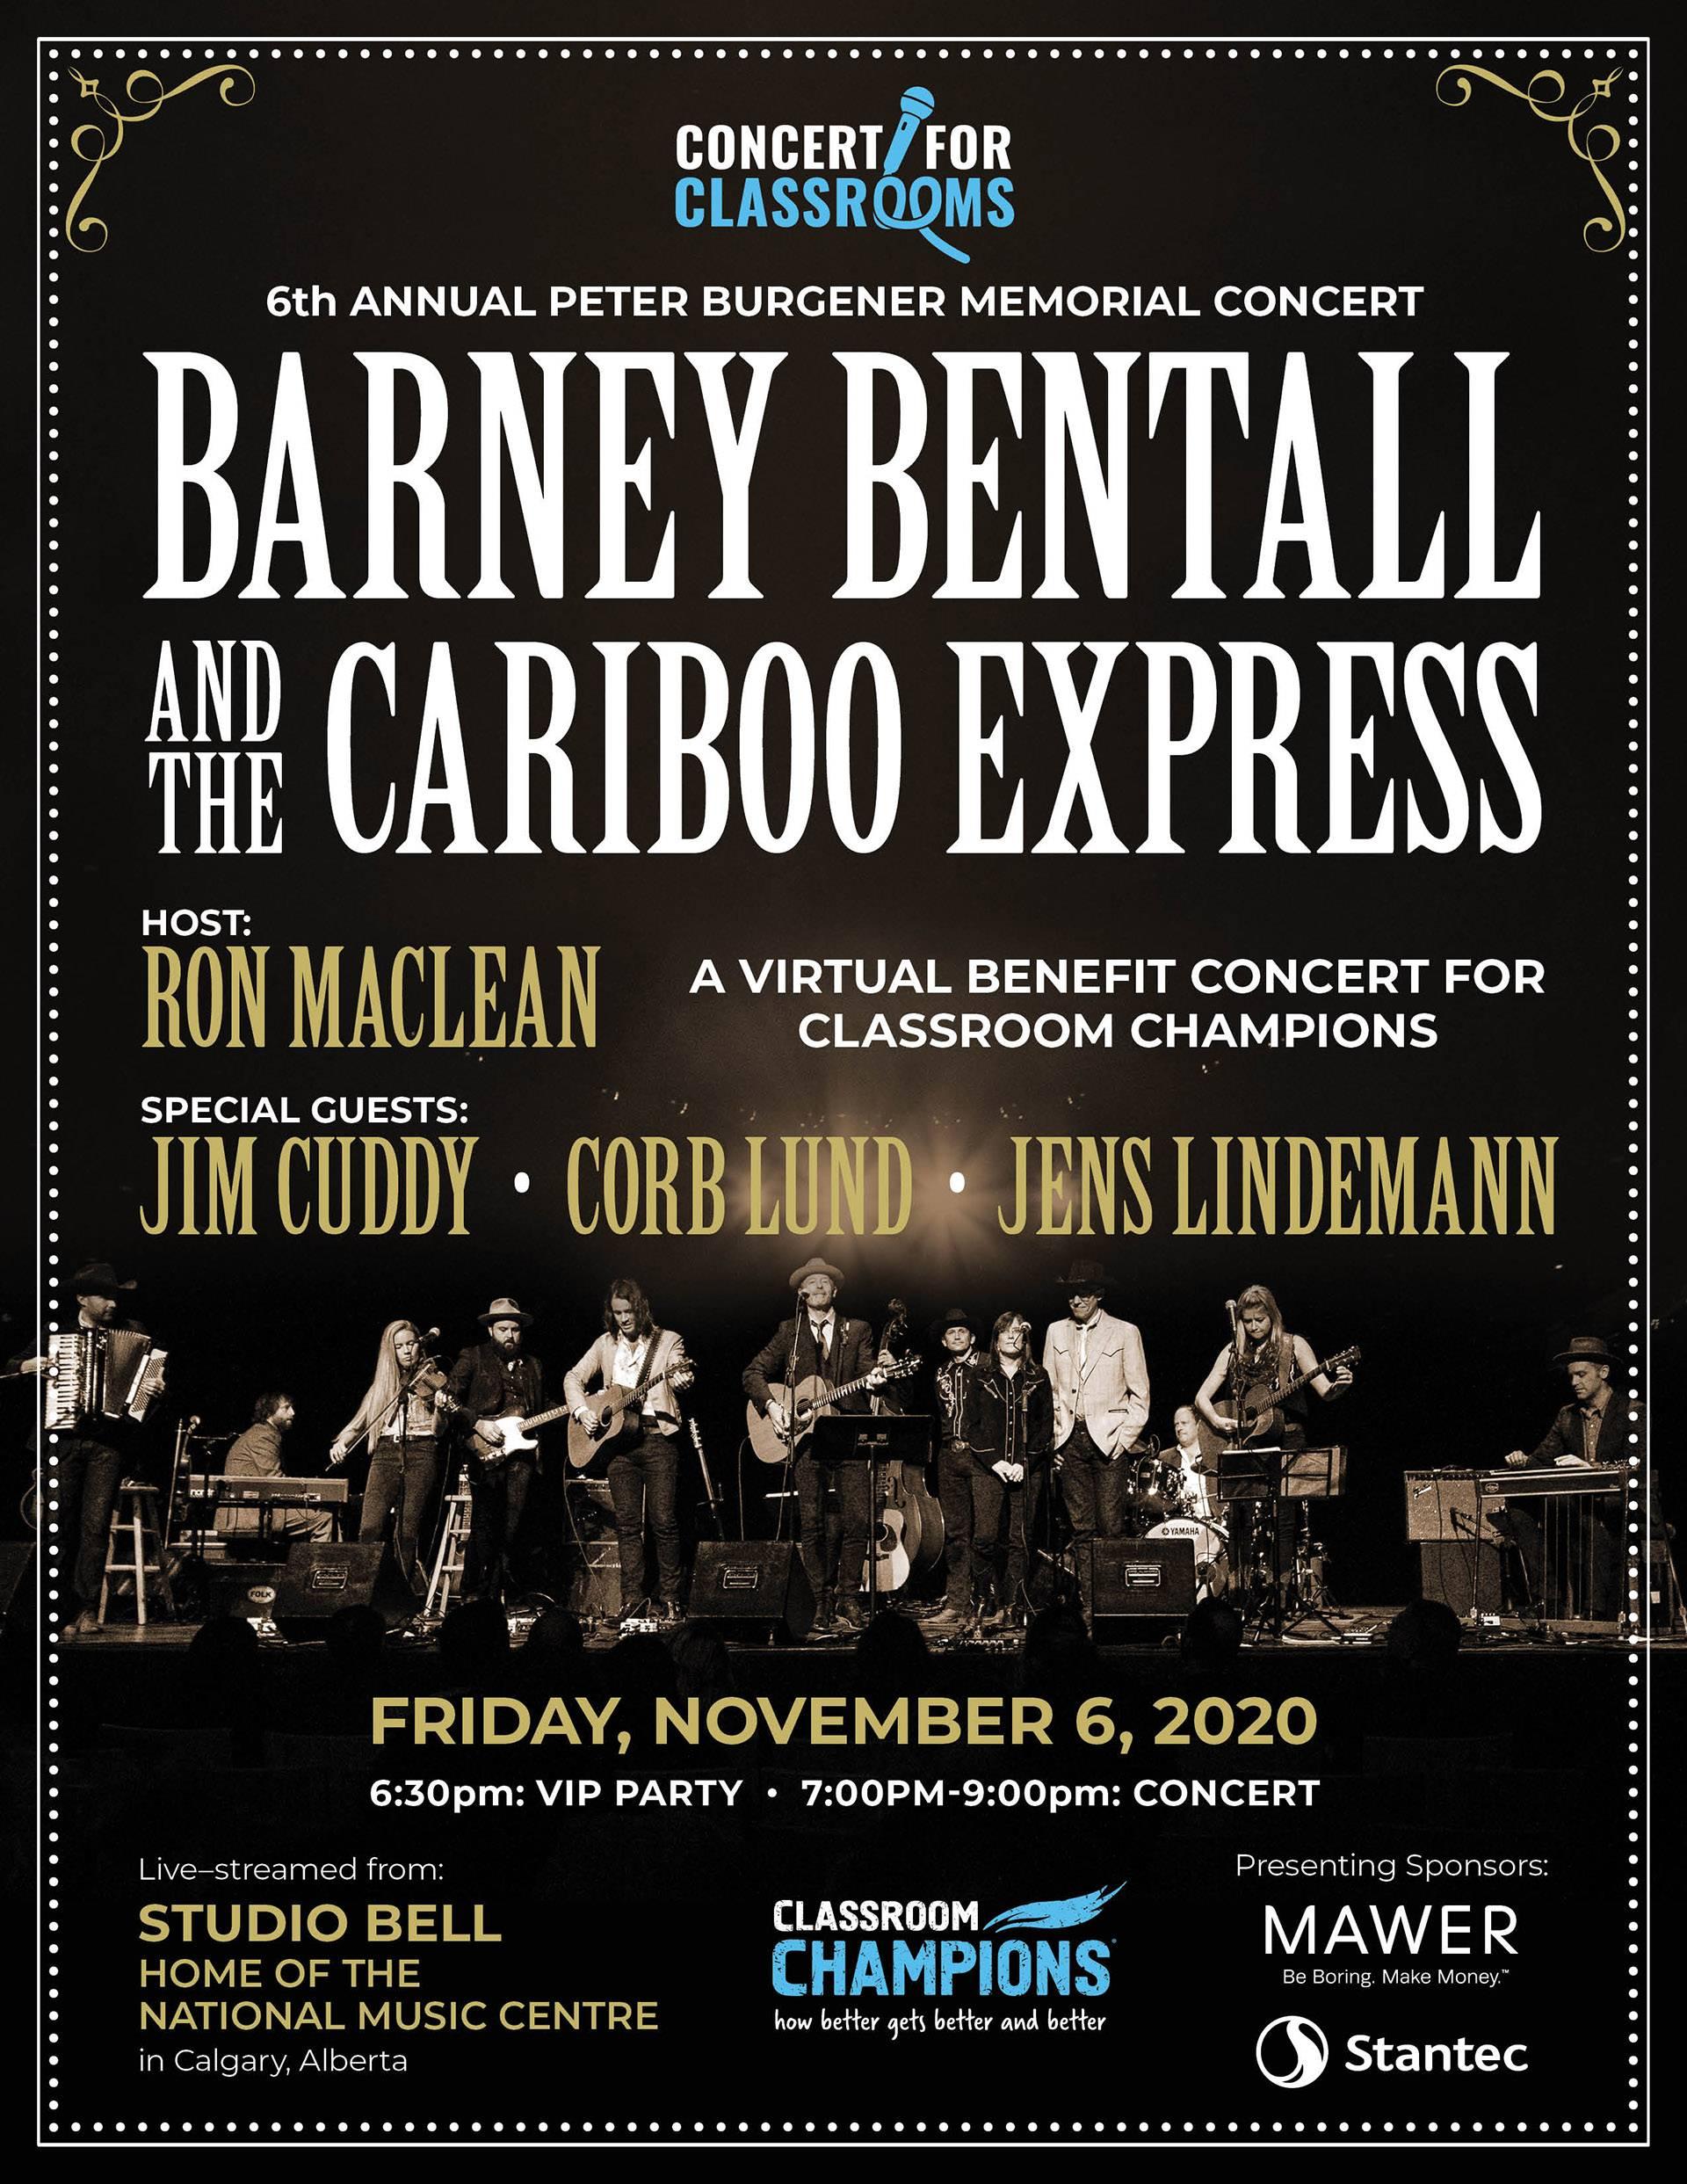 Barney Bentall & The Cariboo Express 2020